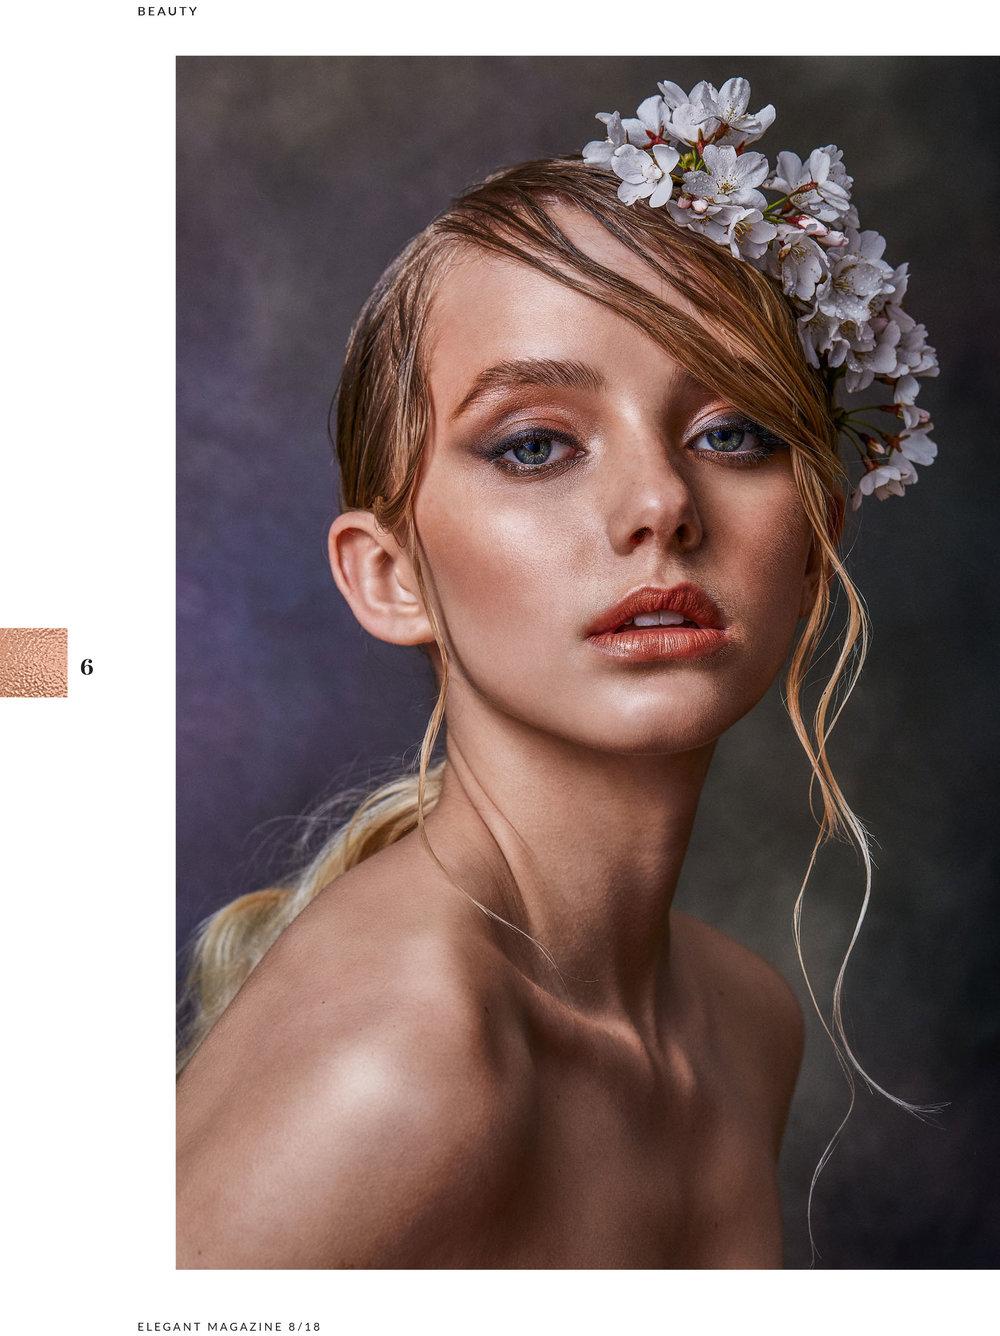 Joseph D Tran - Elegant Magazine - August 2018-6.jpg